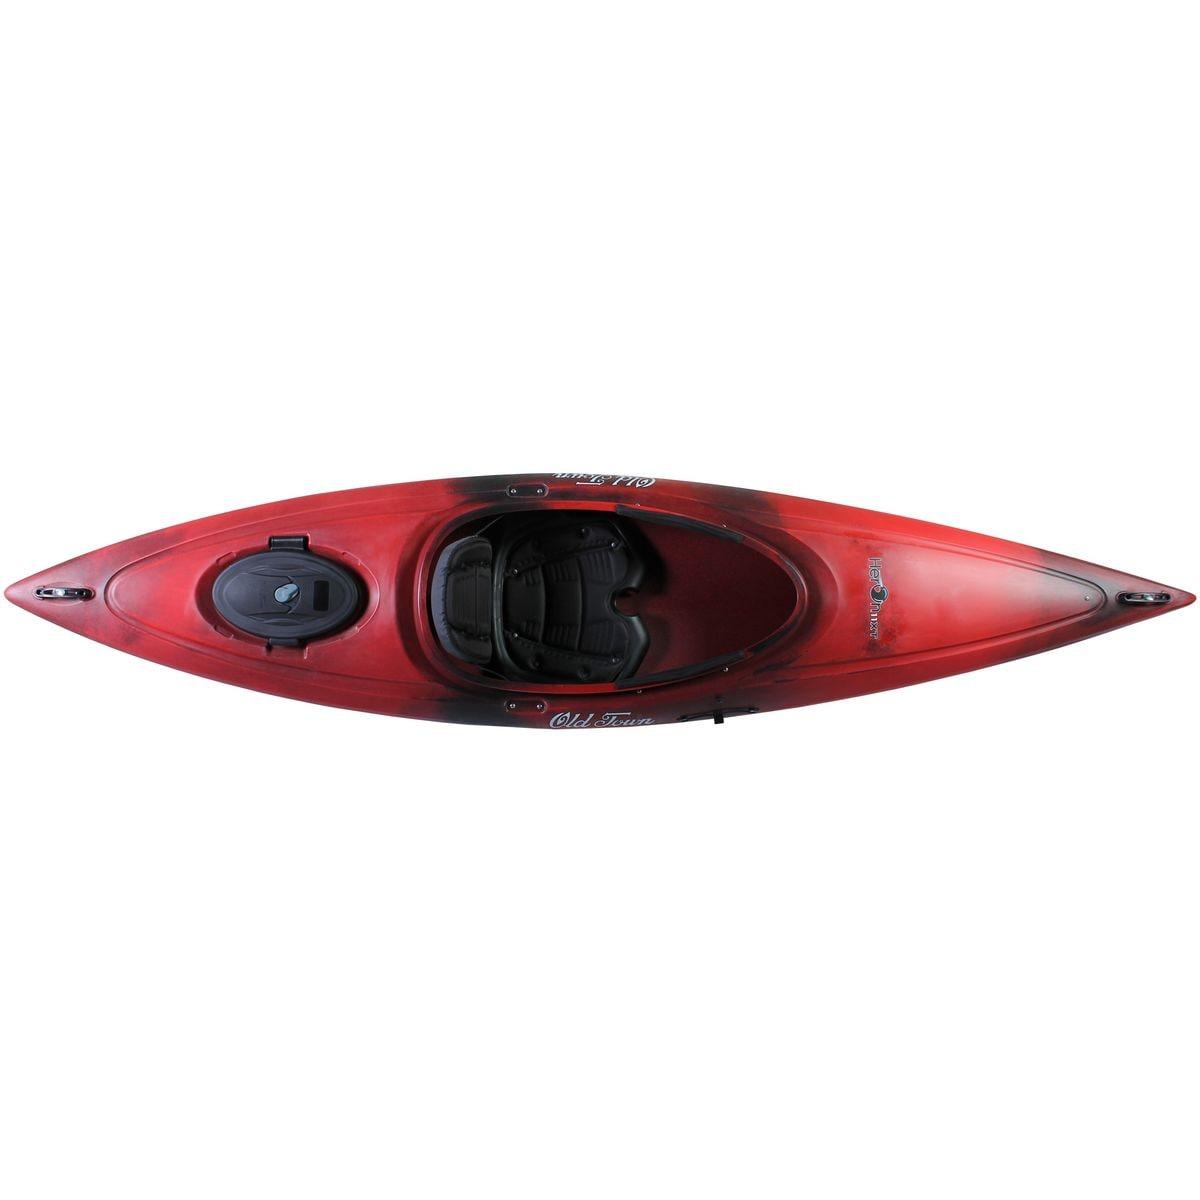 Old Town Heron 11XT Kayak Black Cherry One Size